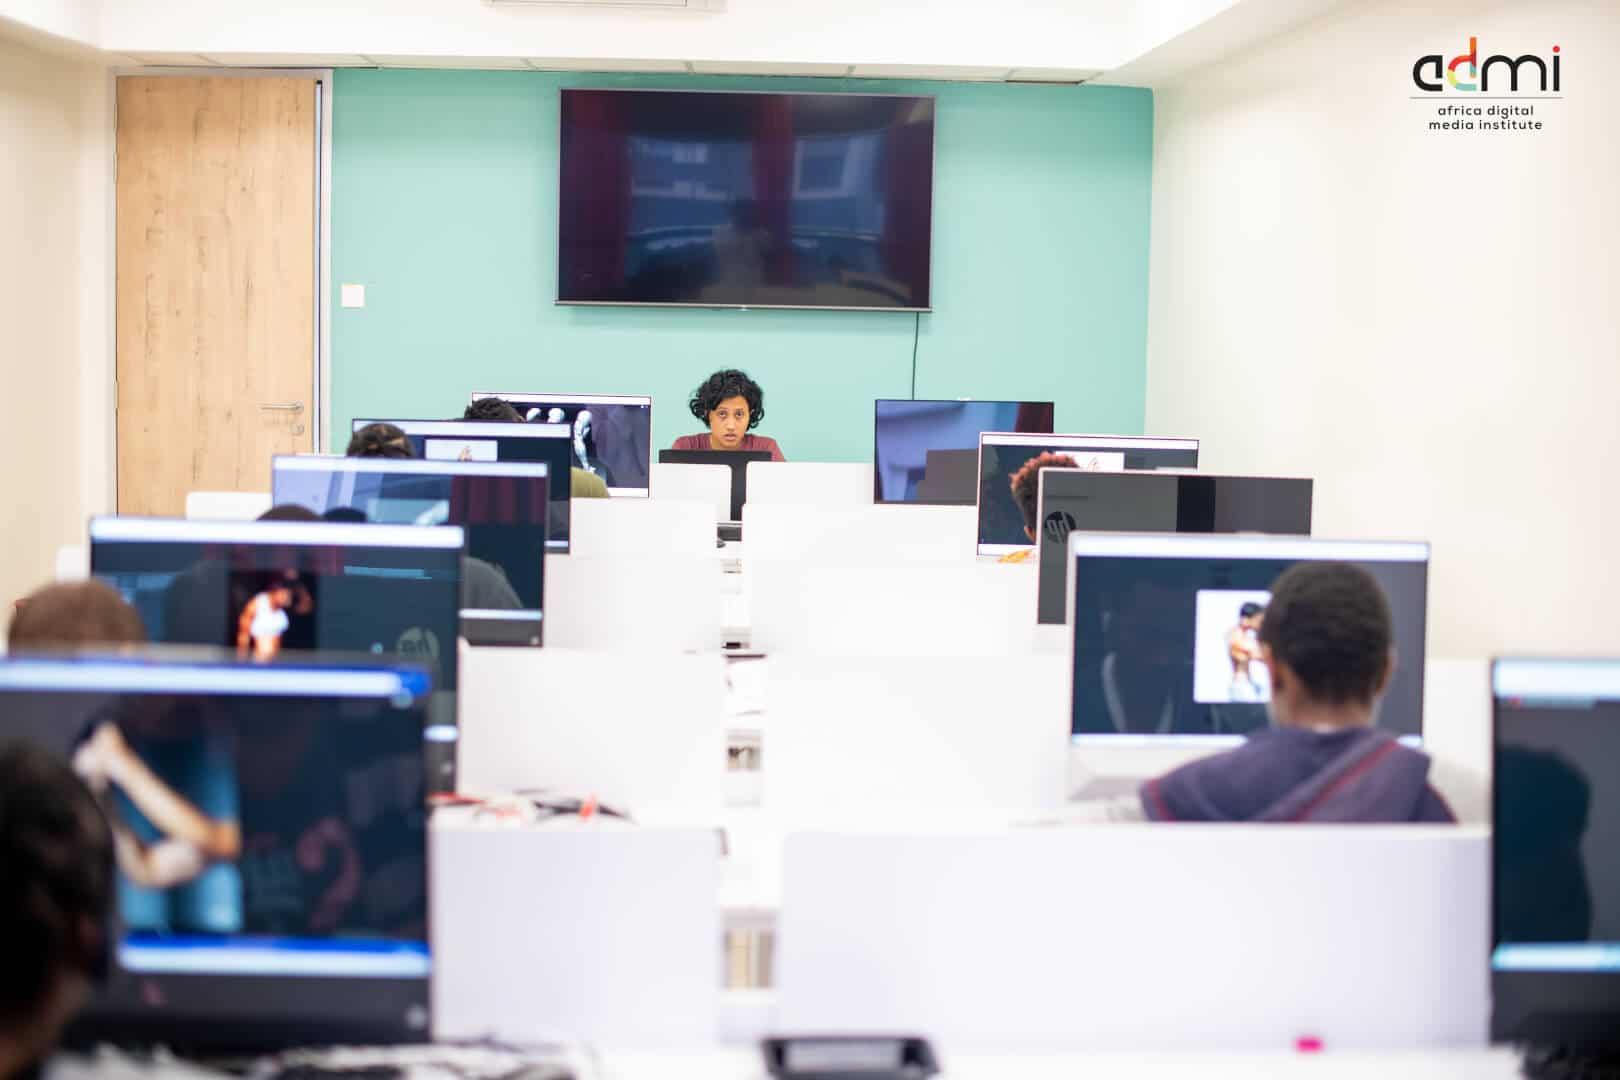 ADMi Computer labs